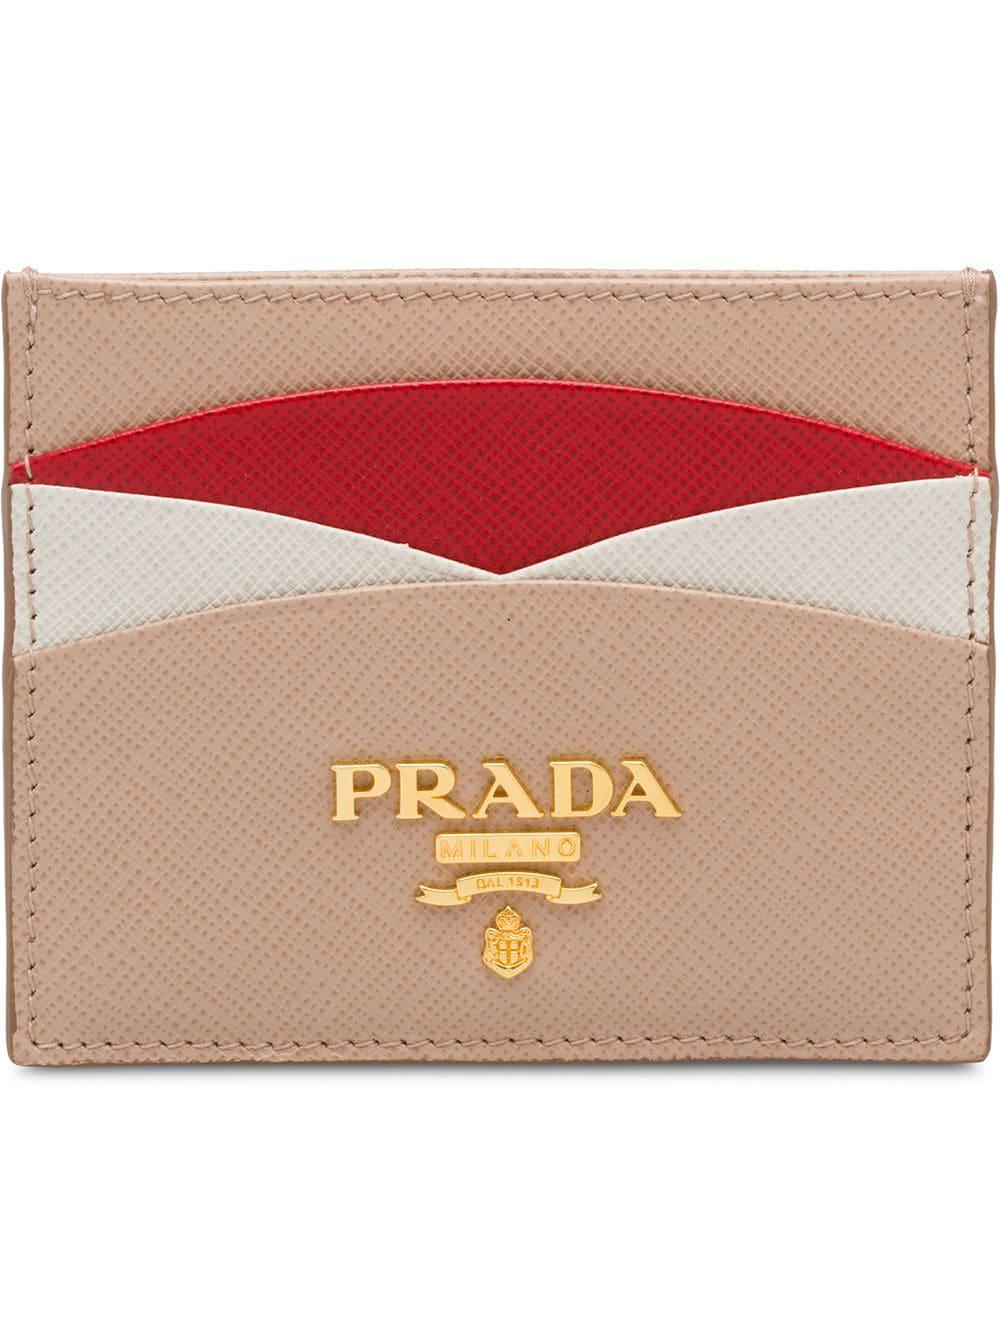 7f271a48d829 Prada Saffiano Leather Credit Card Holder - Pink   ModeSens